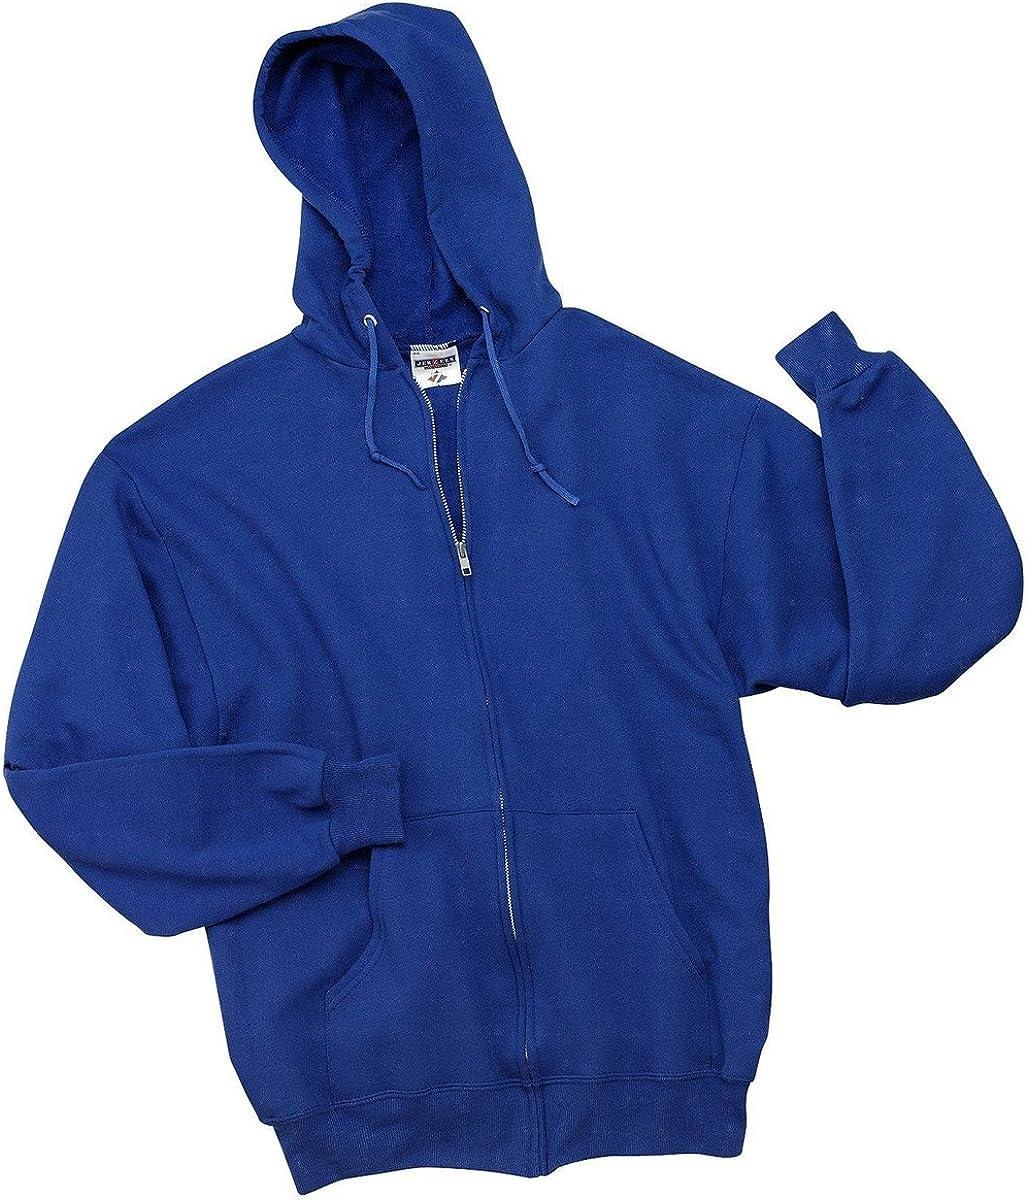 XL Jerzees 50//50 Youth Full-Zip Hooded Sweatshirt Royal 993B